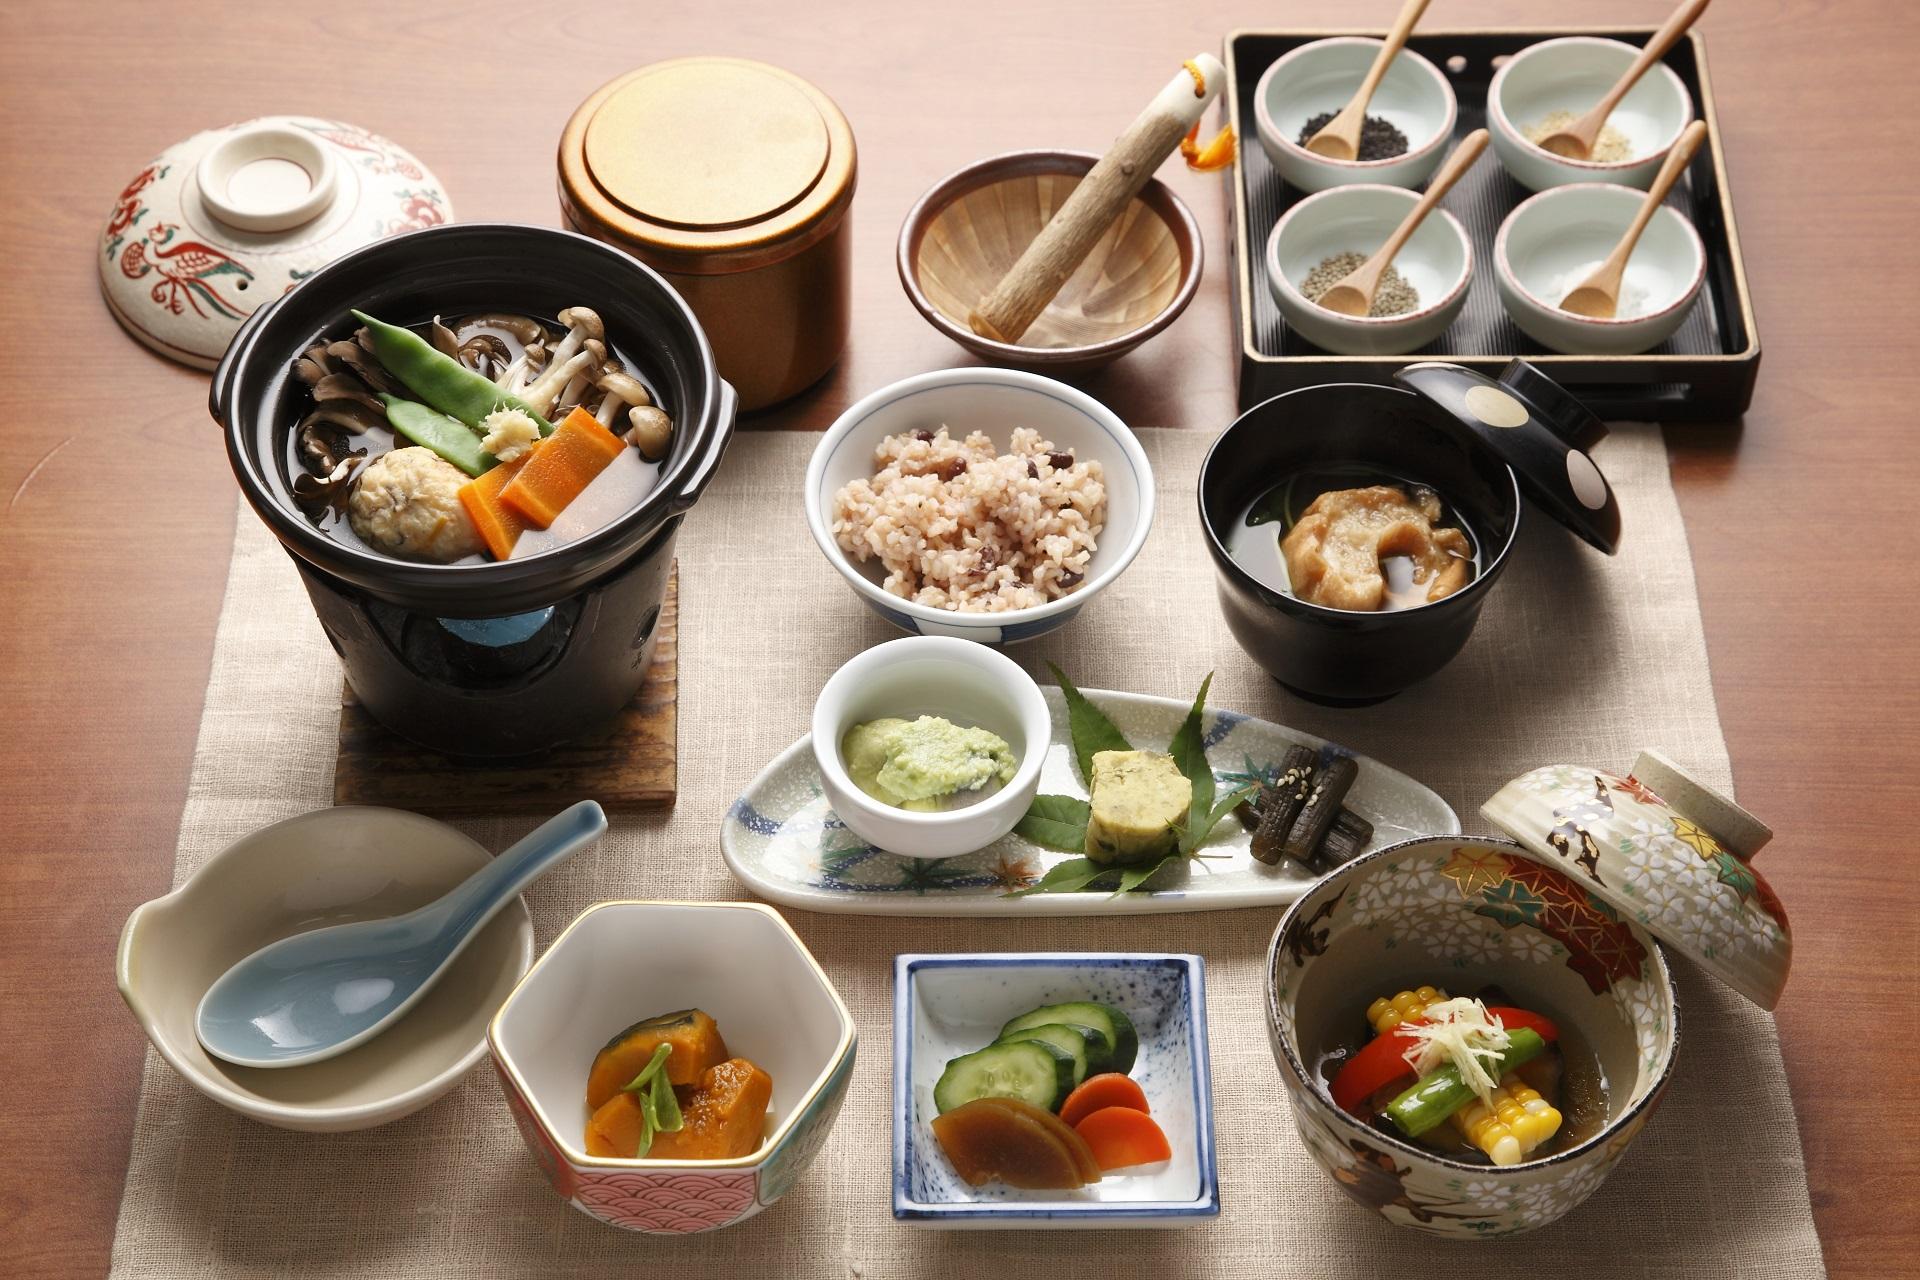 Ichijiru Sansai meals